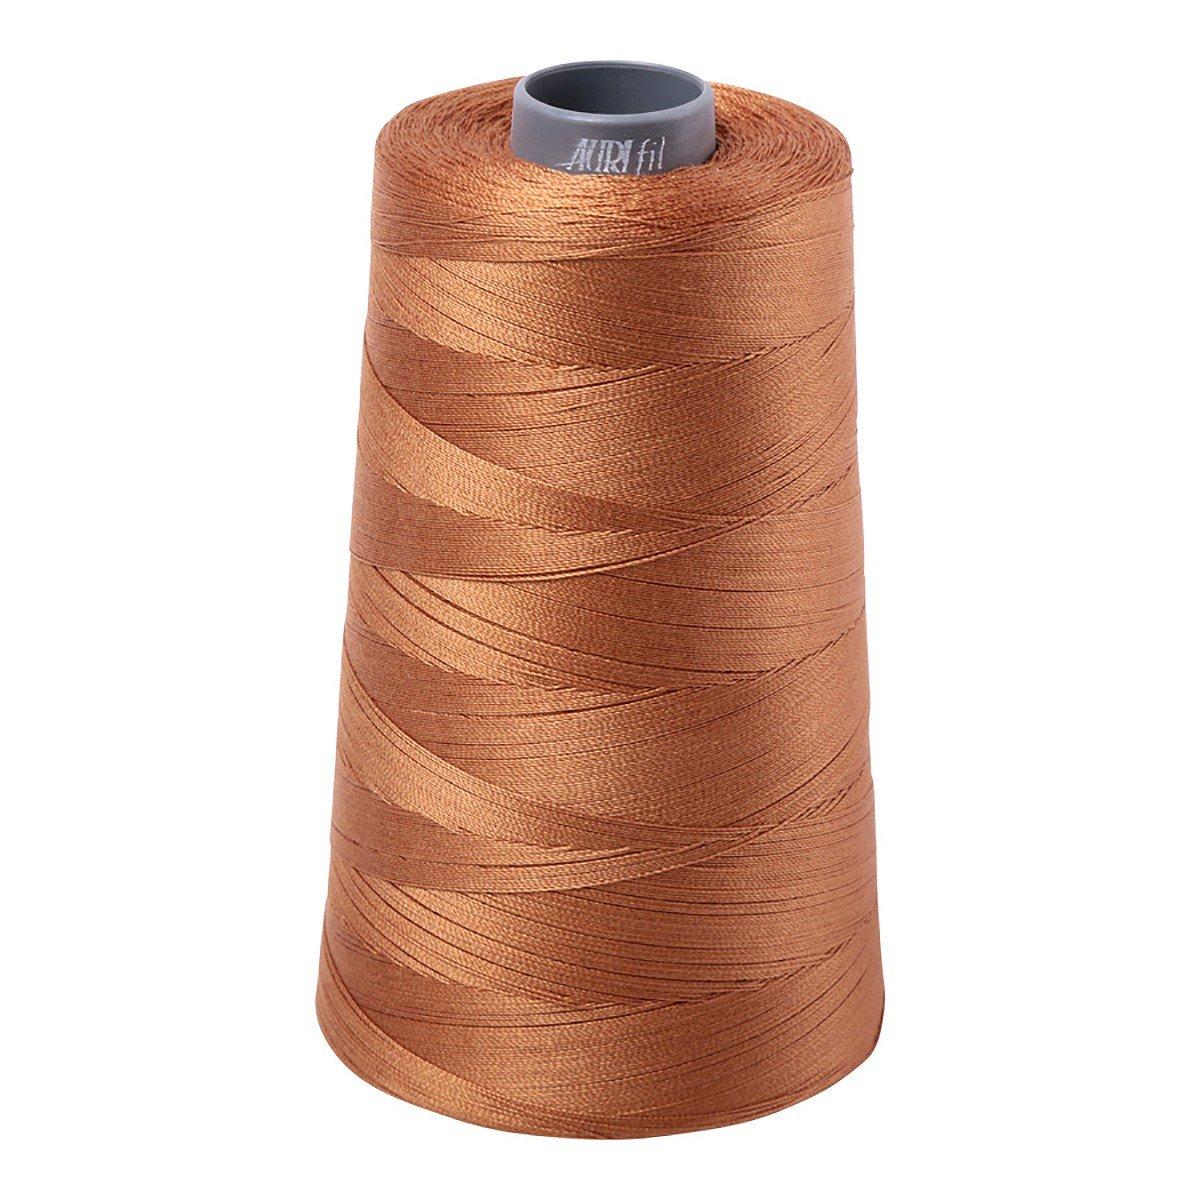 Mako (Cotton) Embroidery Thread 28wt 3609yds Light Cinnamon